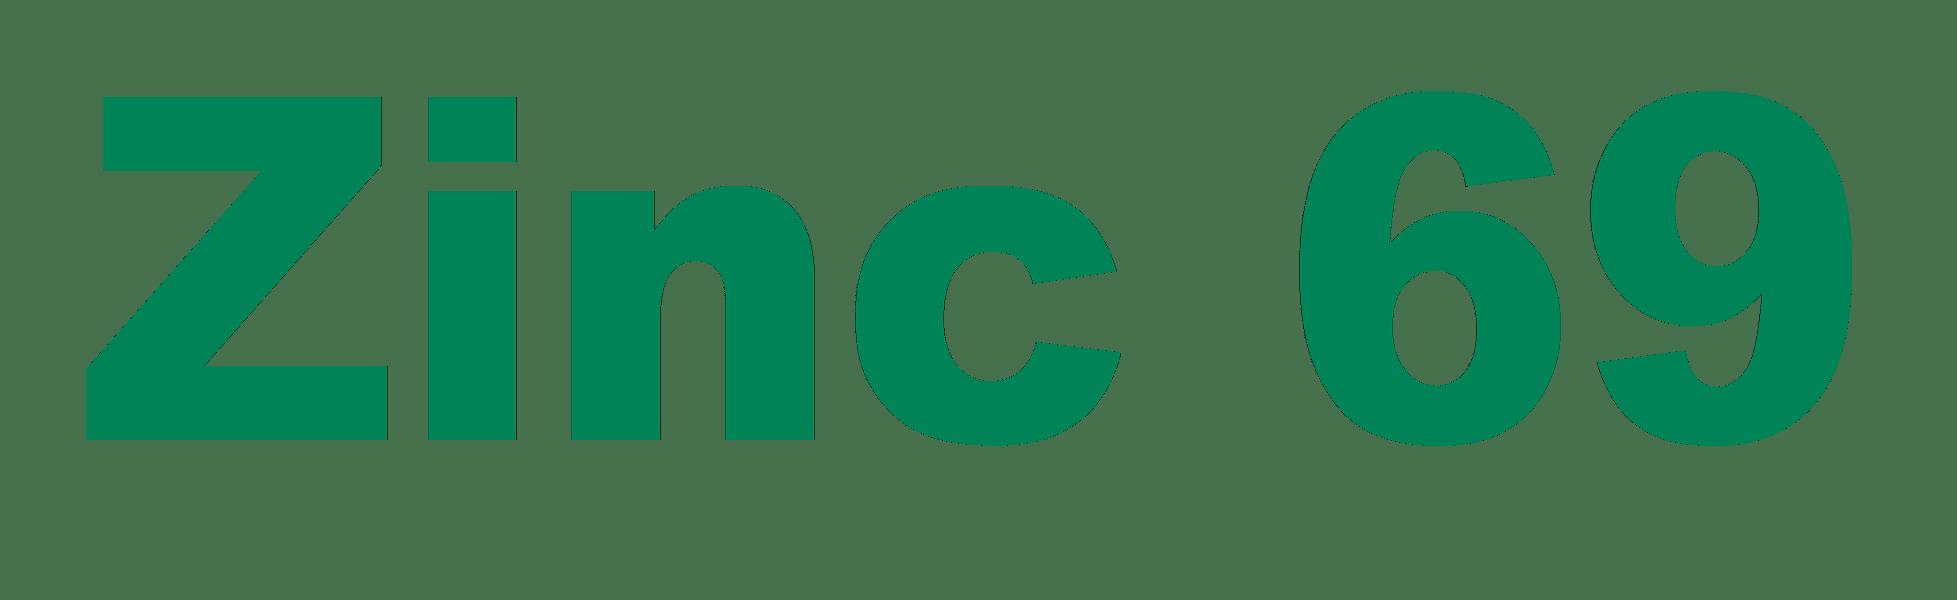 zinc-logo